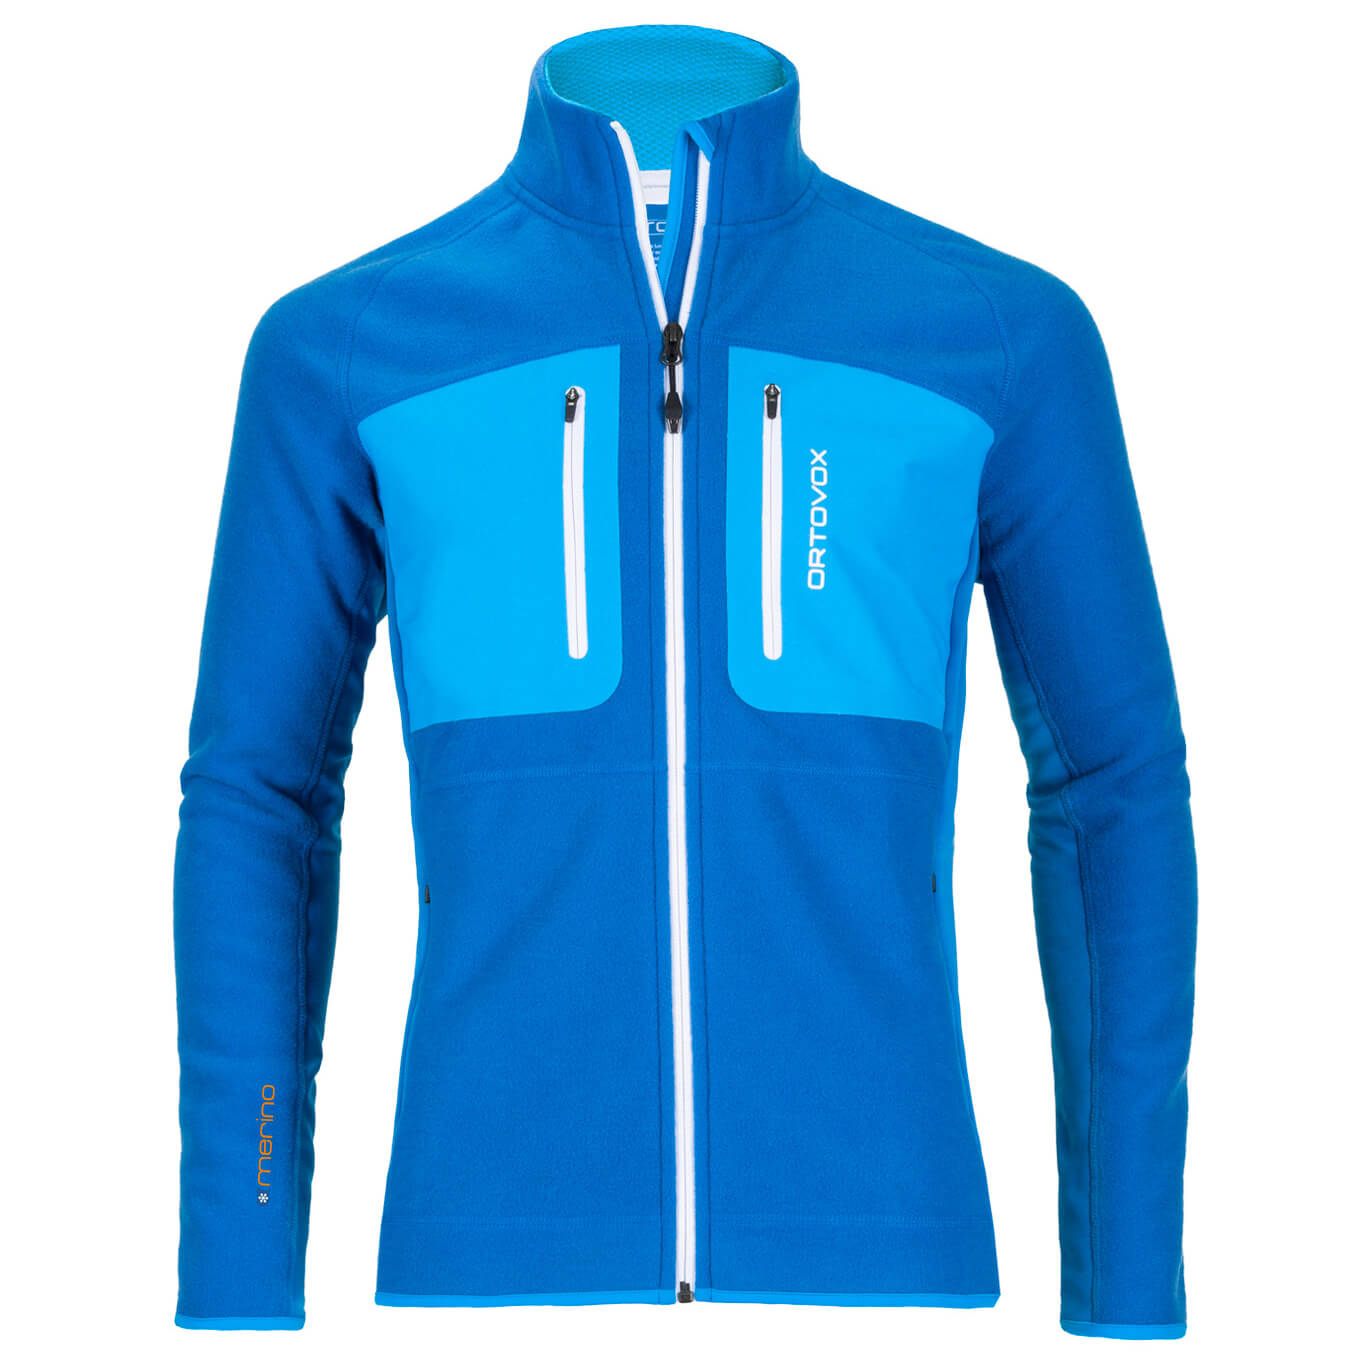 Softshell Homme Tec Ortovox Jacket Fleece Veste Merino ARqcLS45j3